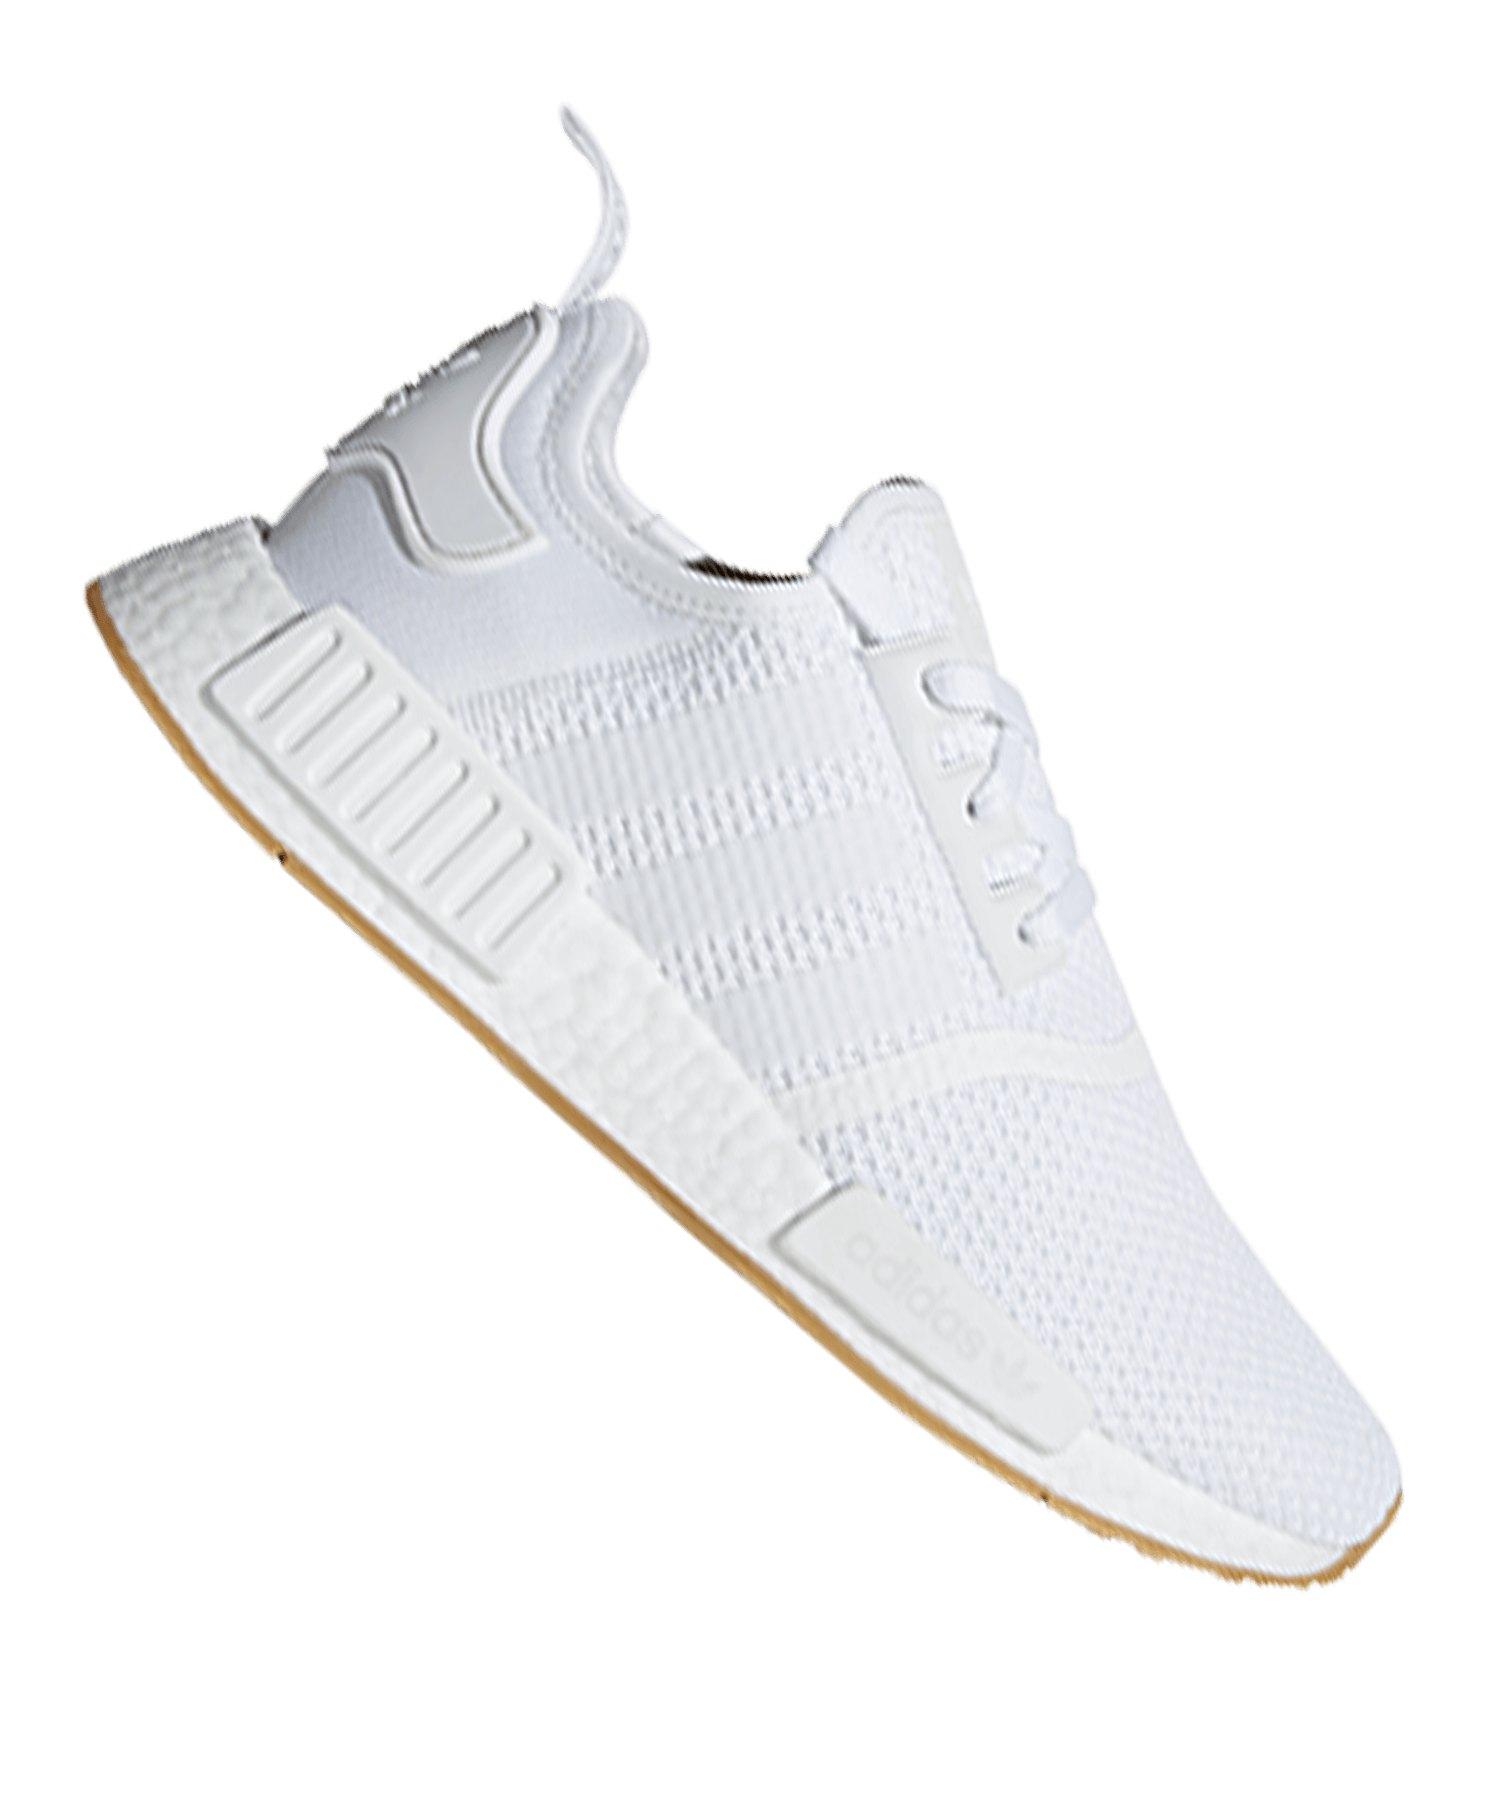 Adidas D96635 ab 89,99 € | Preisvergleich bei